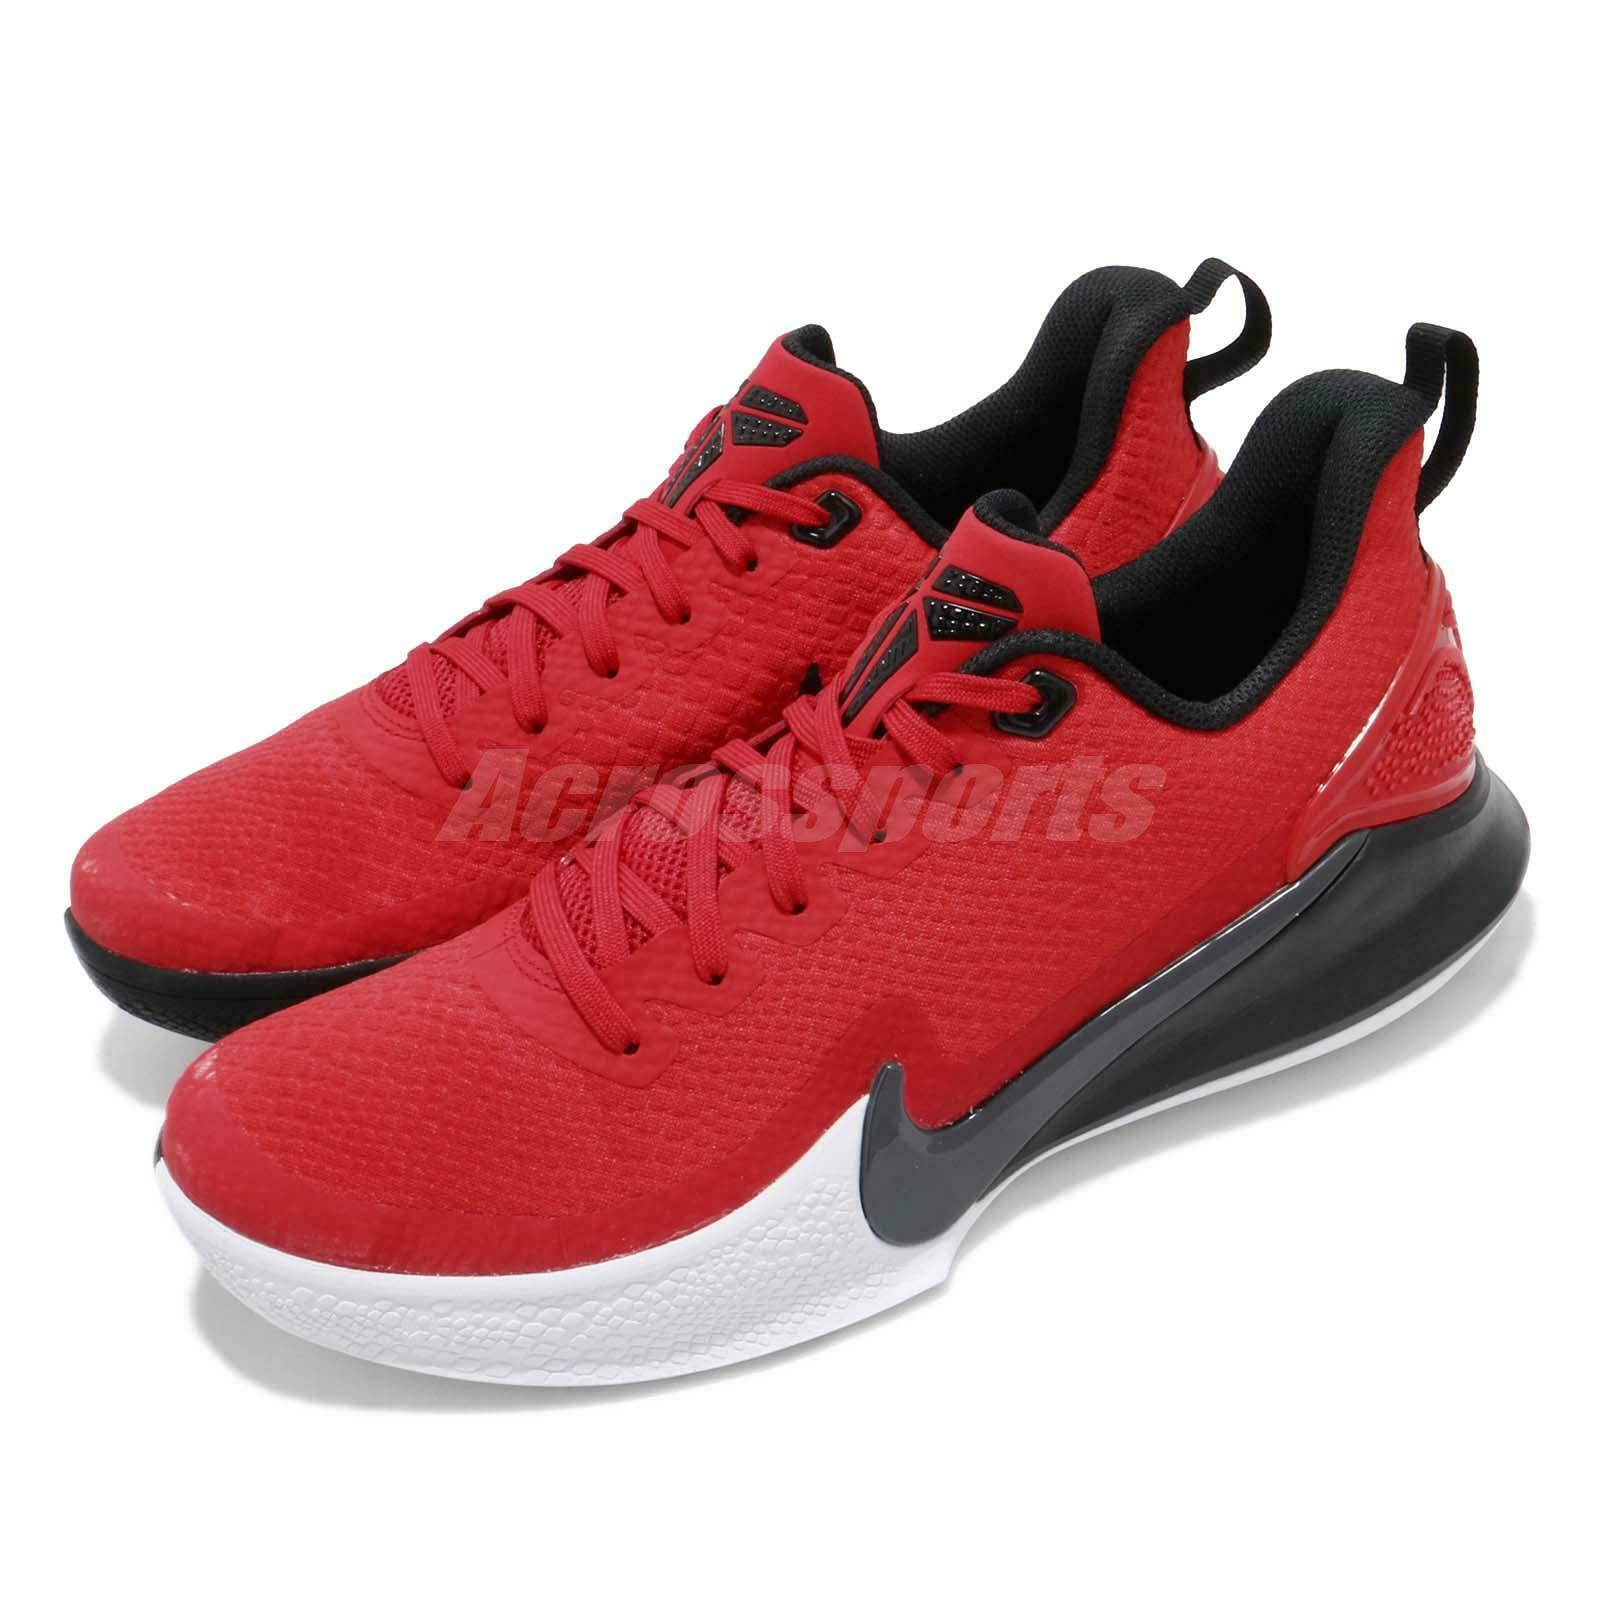 Nike Mamba Focus EP Kobe Bryant Red Black White Men Basketball shoes AO4434-600